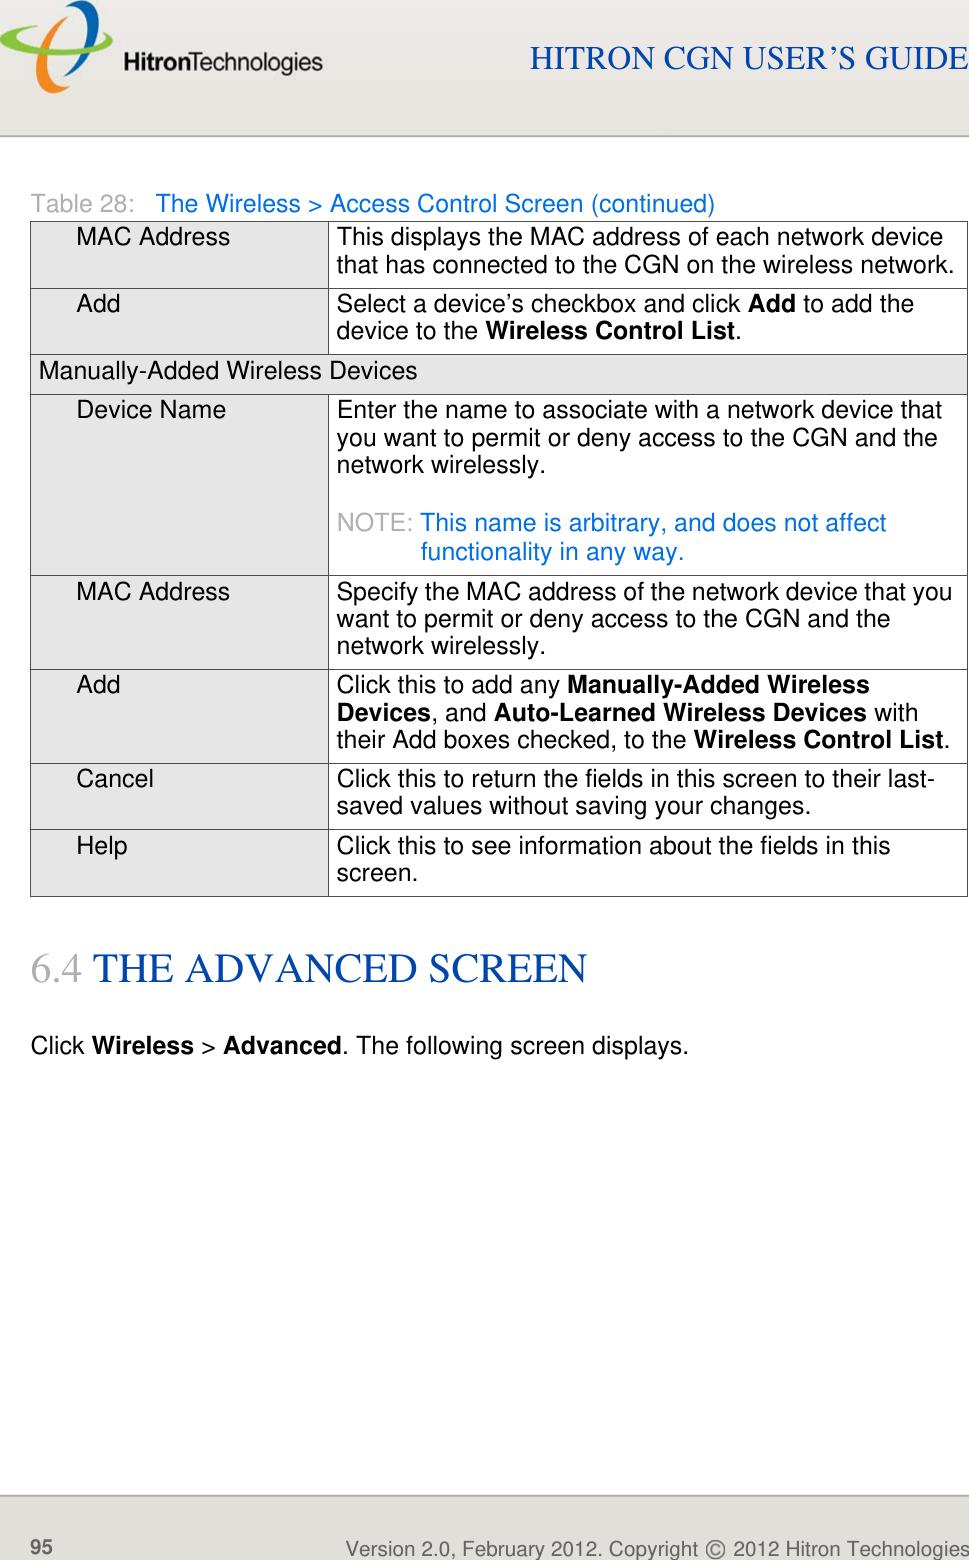 hitron cgn2-rog user manual